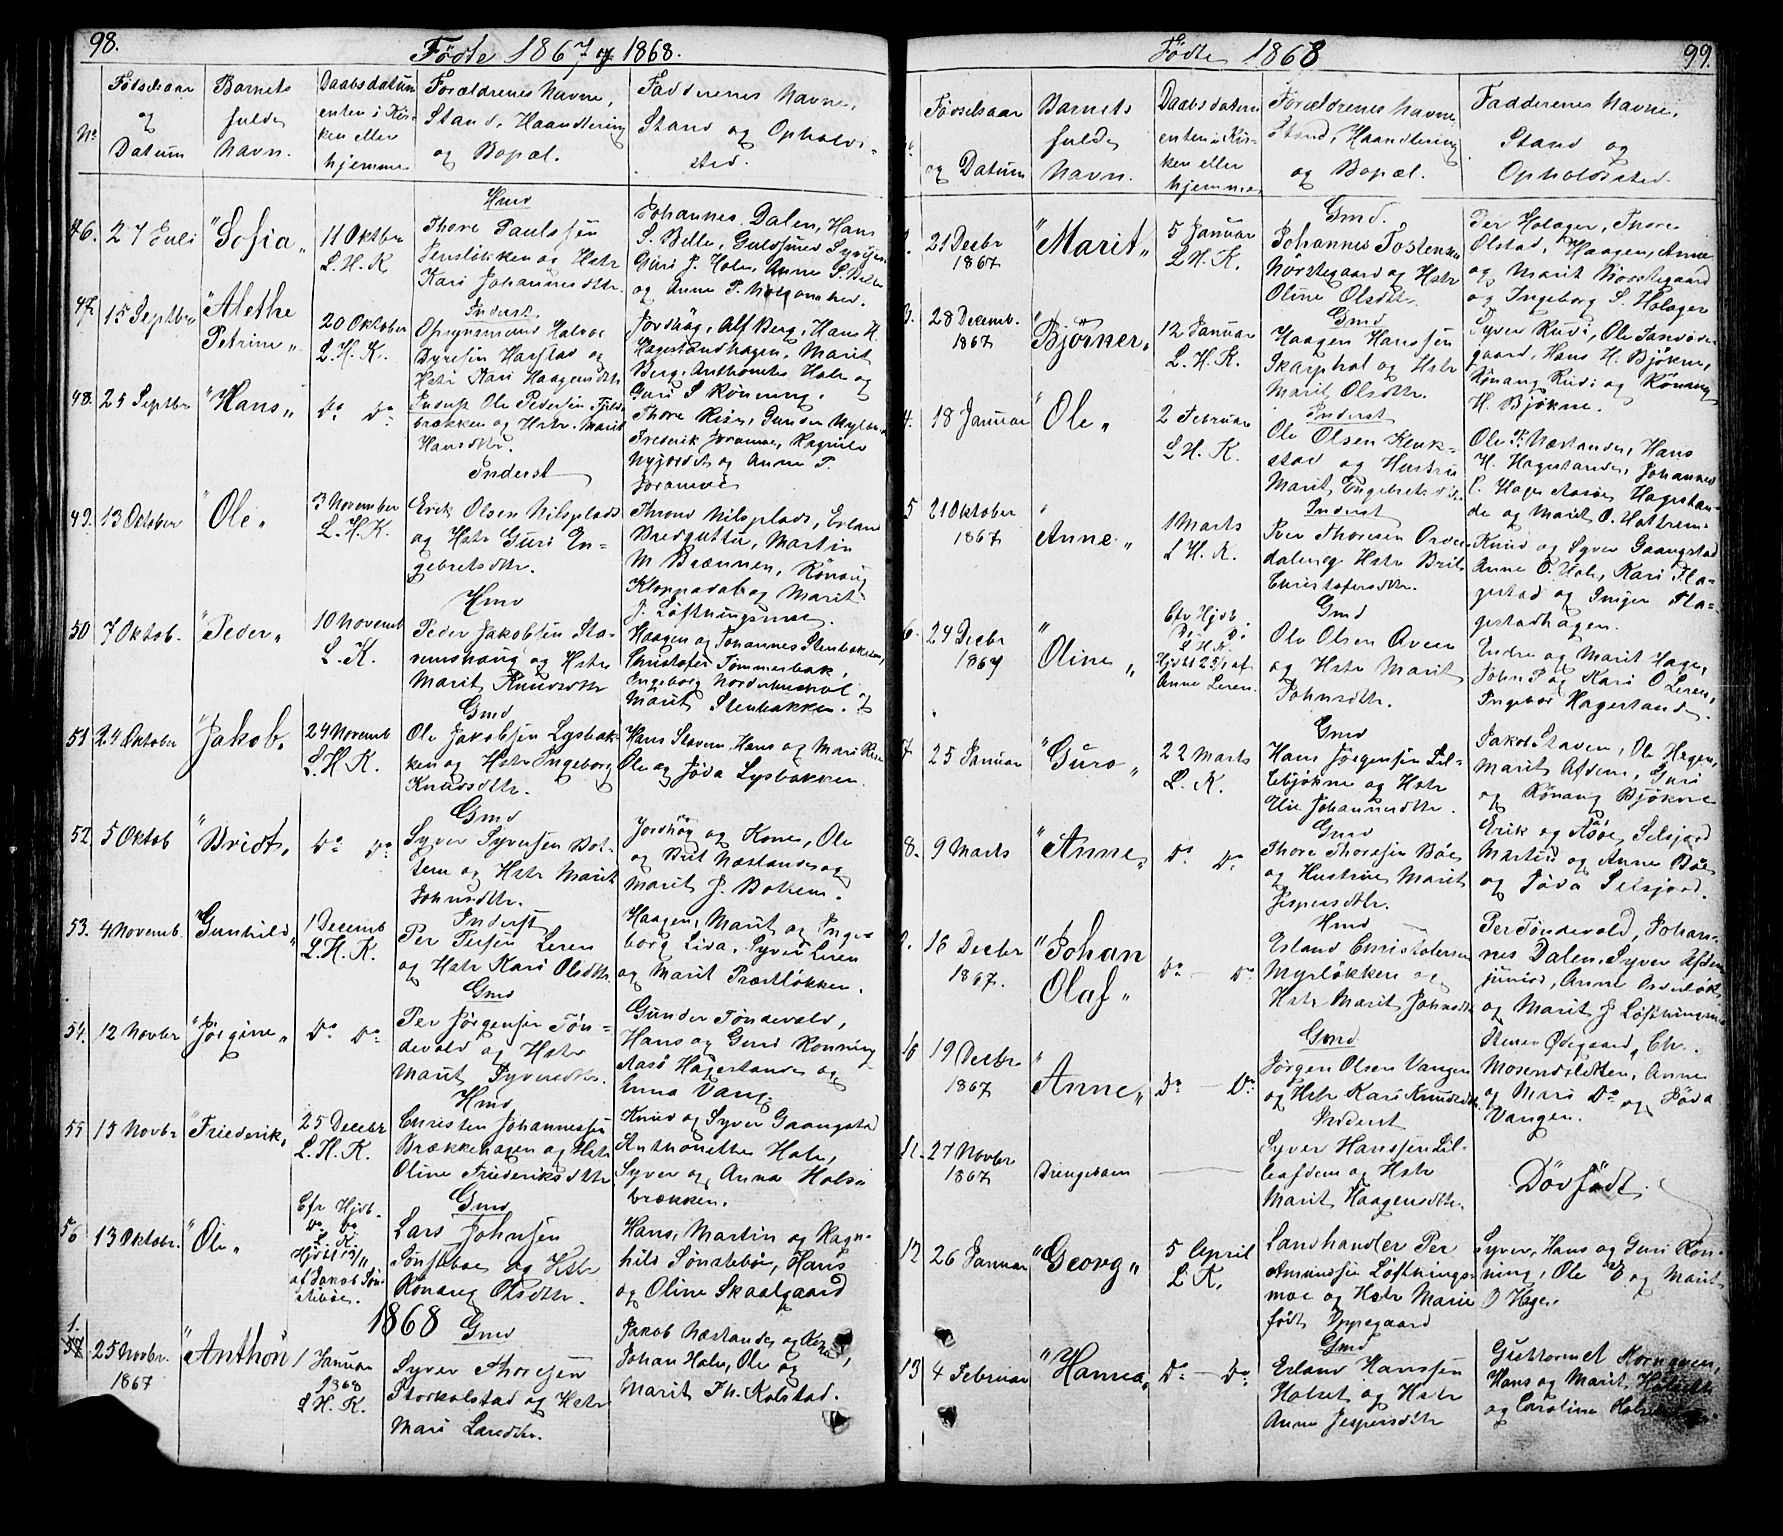 SAH, Lesja prestekontor, Klokkerbok nr. 5, 1850-1894, s. 98-99